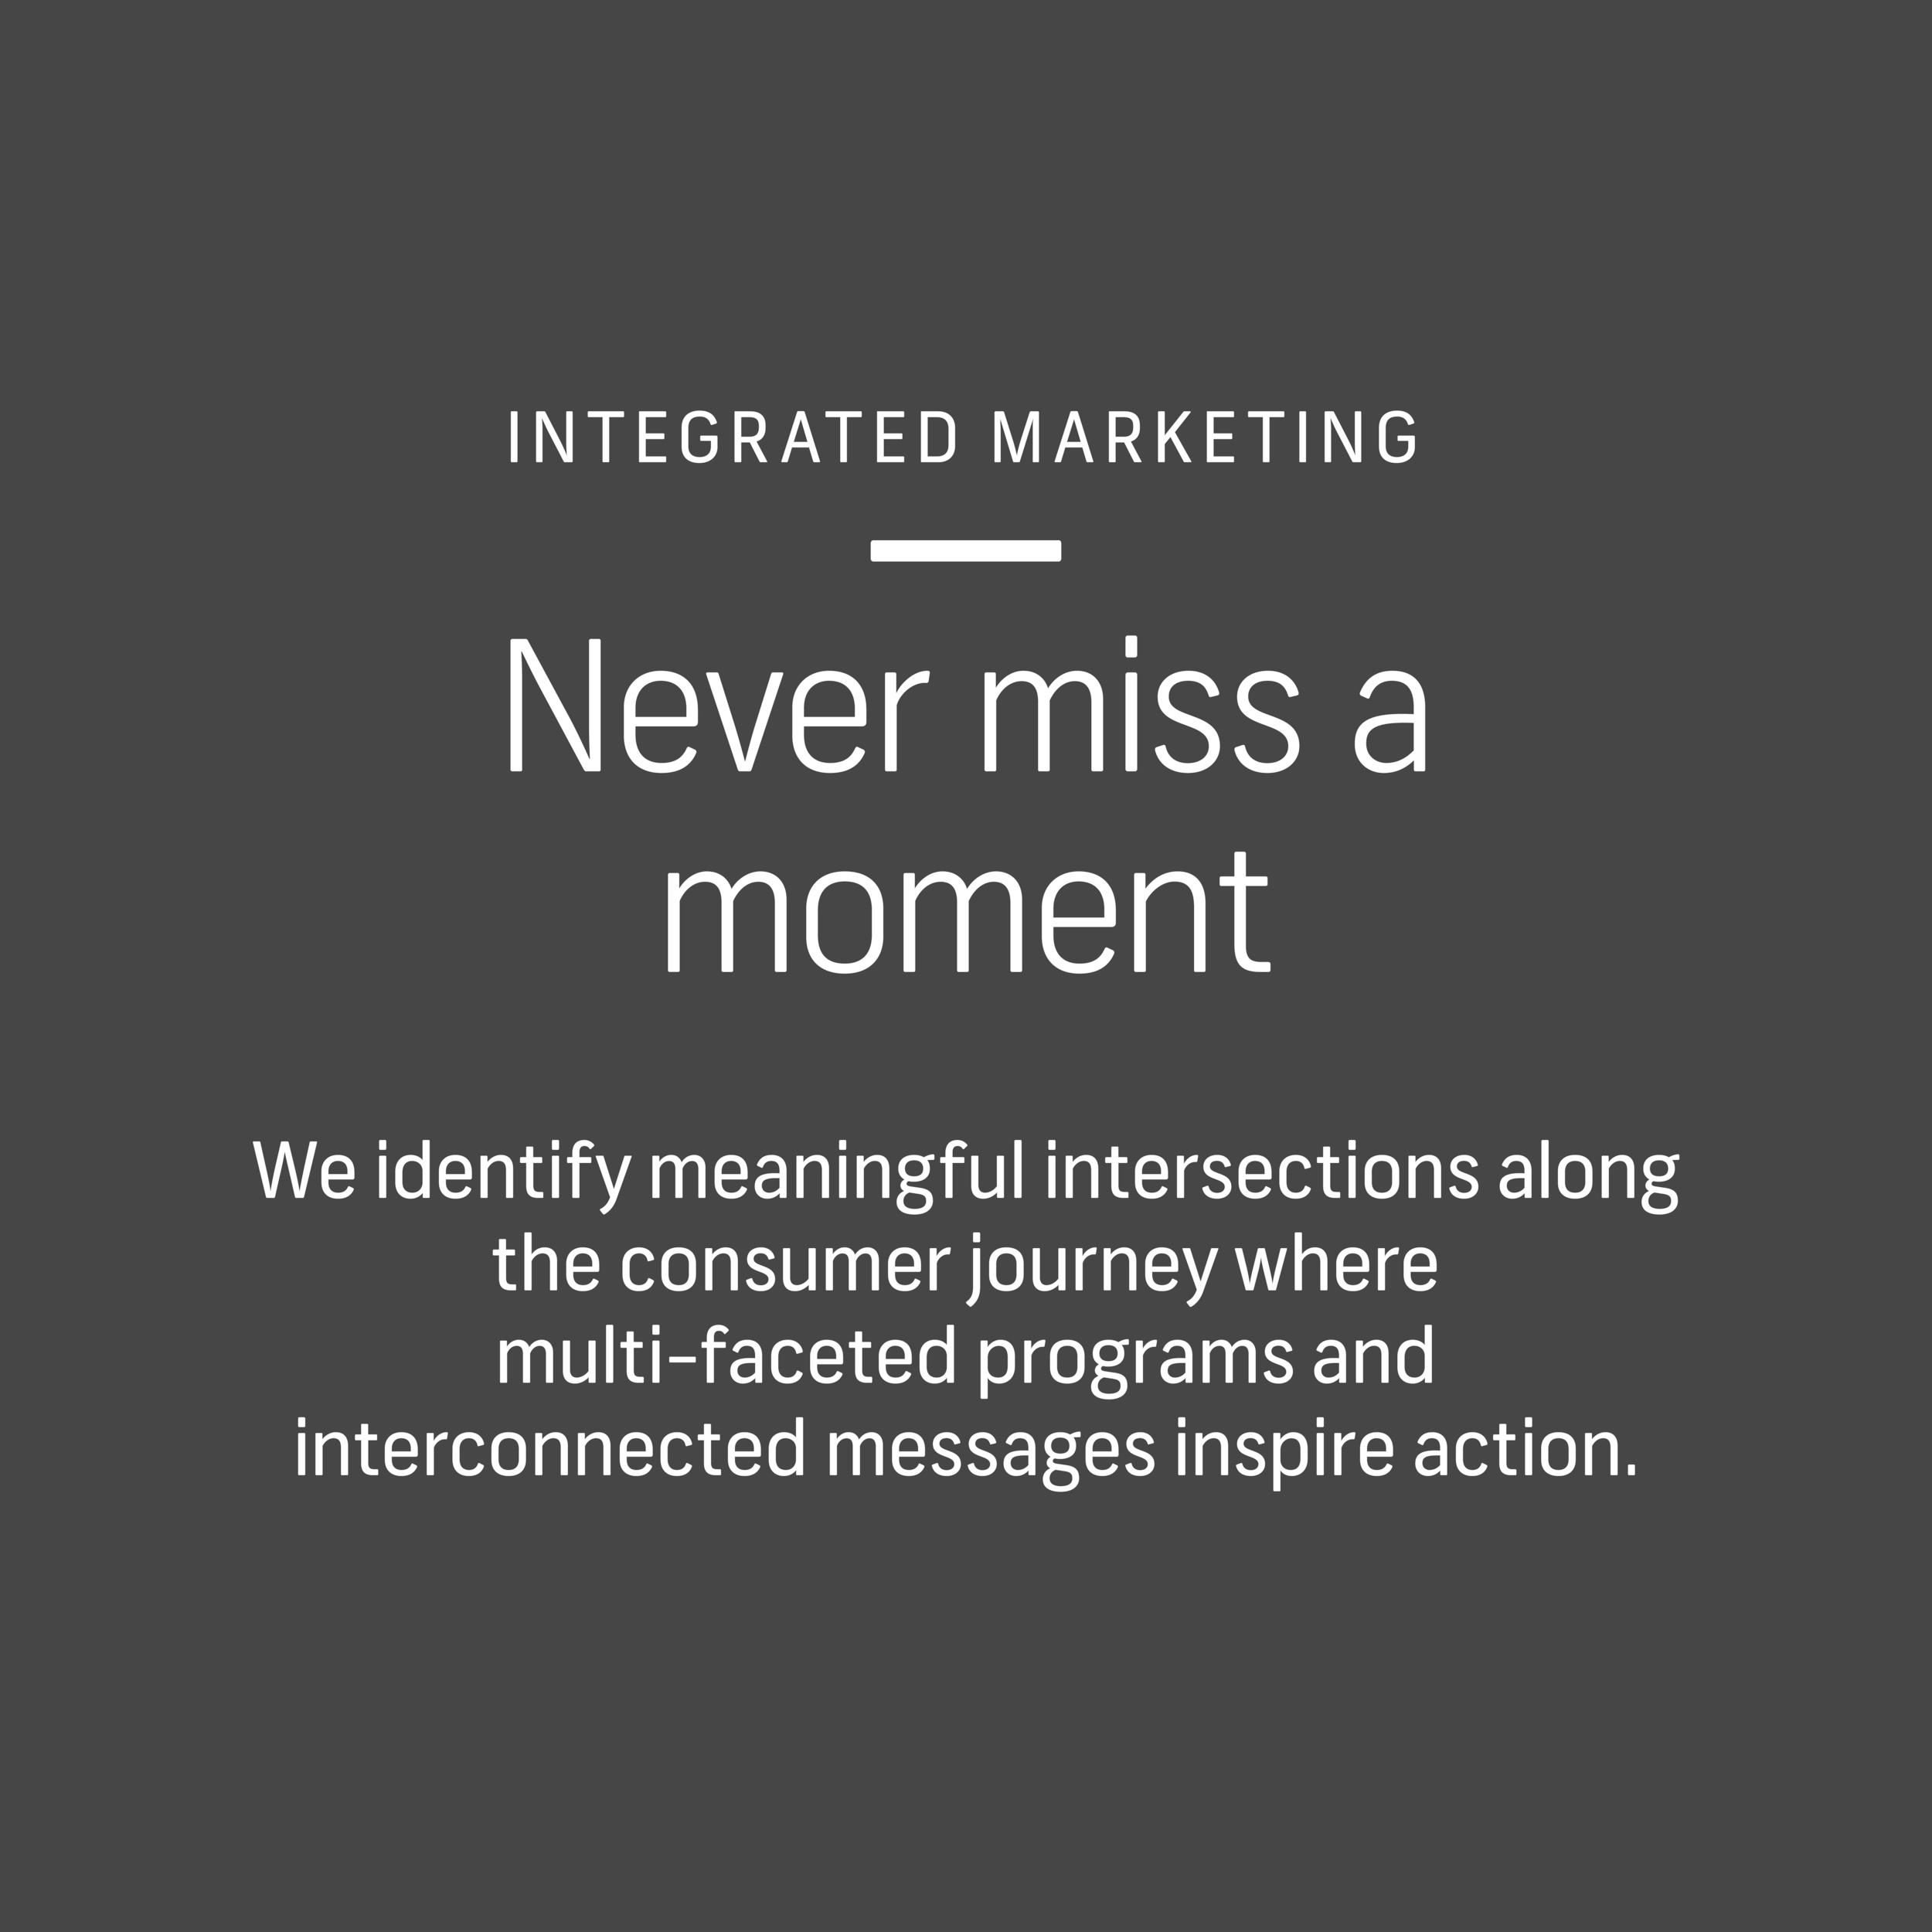 capabilities-headline-_integrated marketing.png